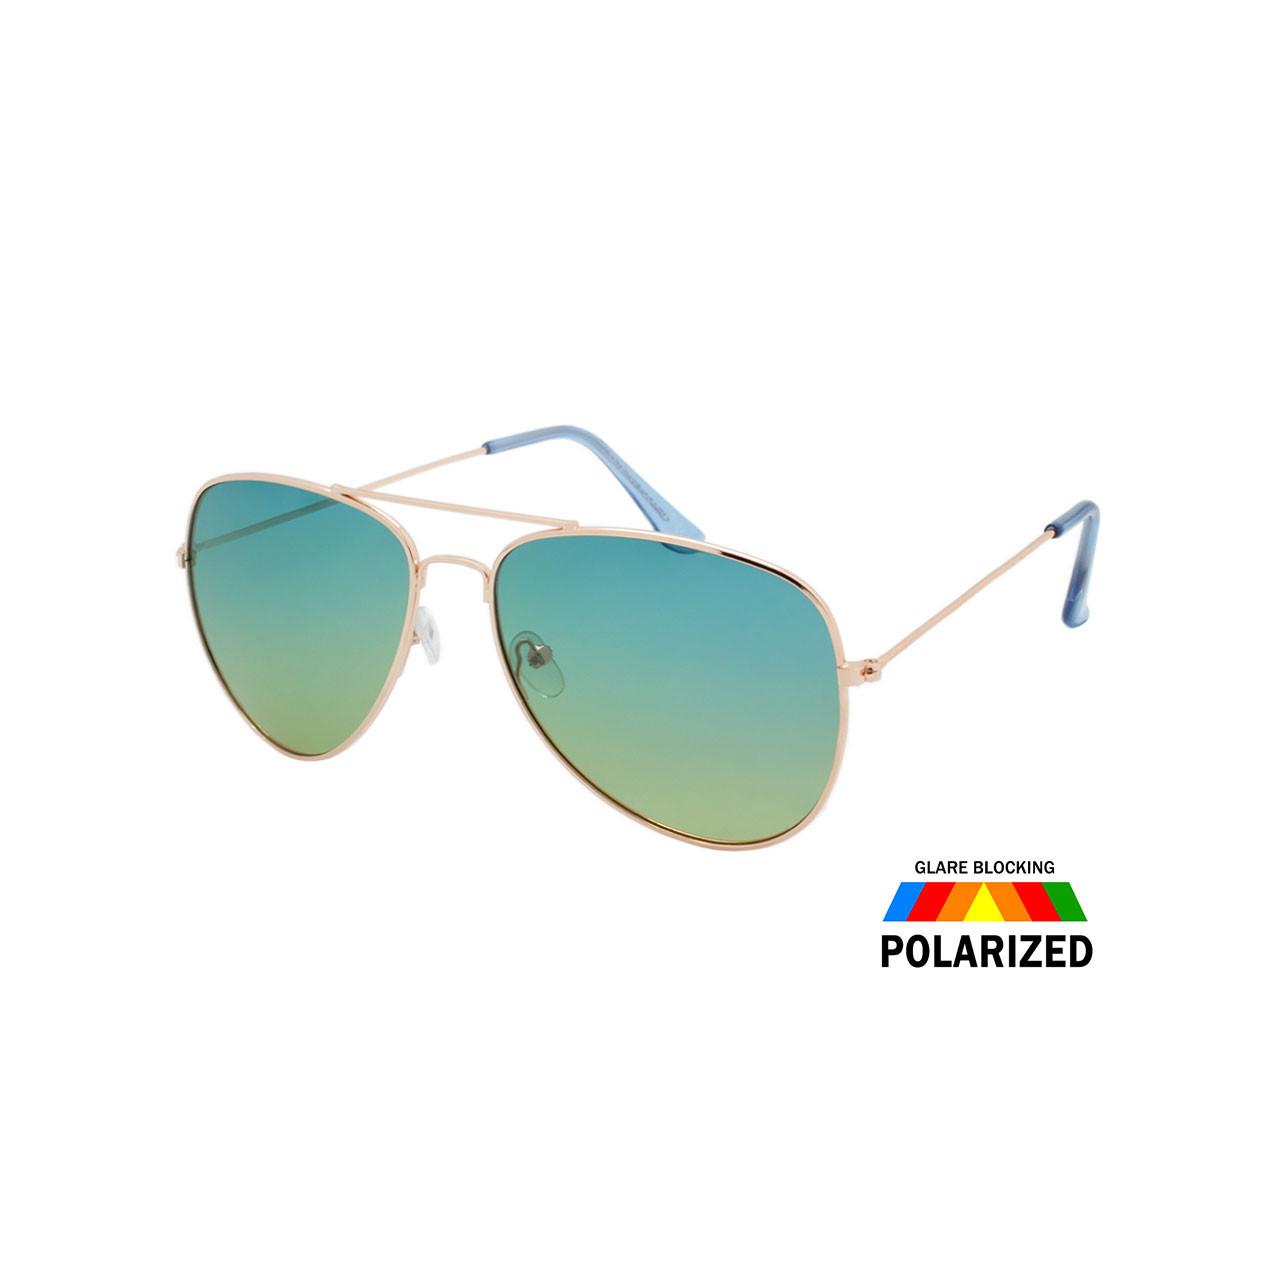 5ead15d04a66 Wholesale Assorted Colors Metal Polarized Aviator Sunglasses Women ...